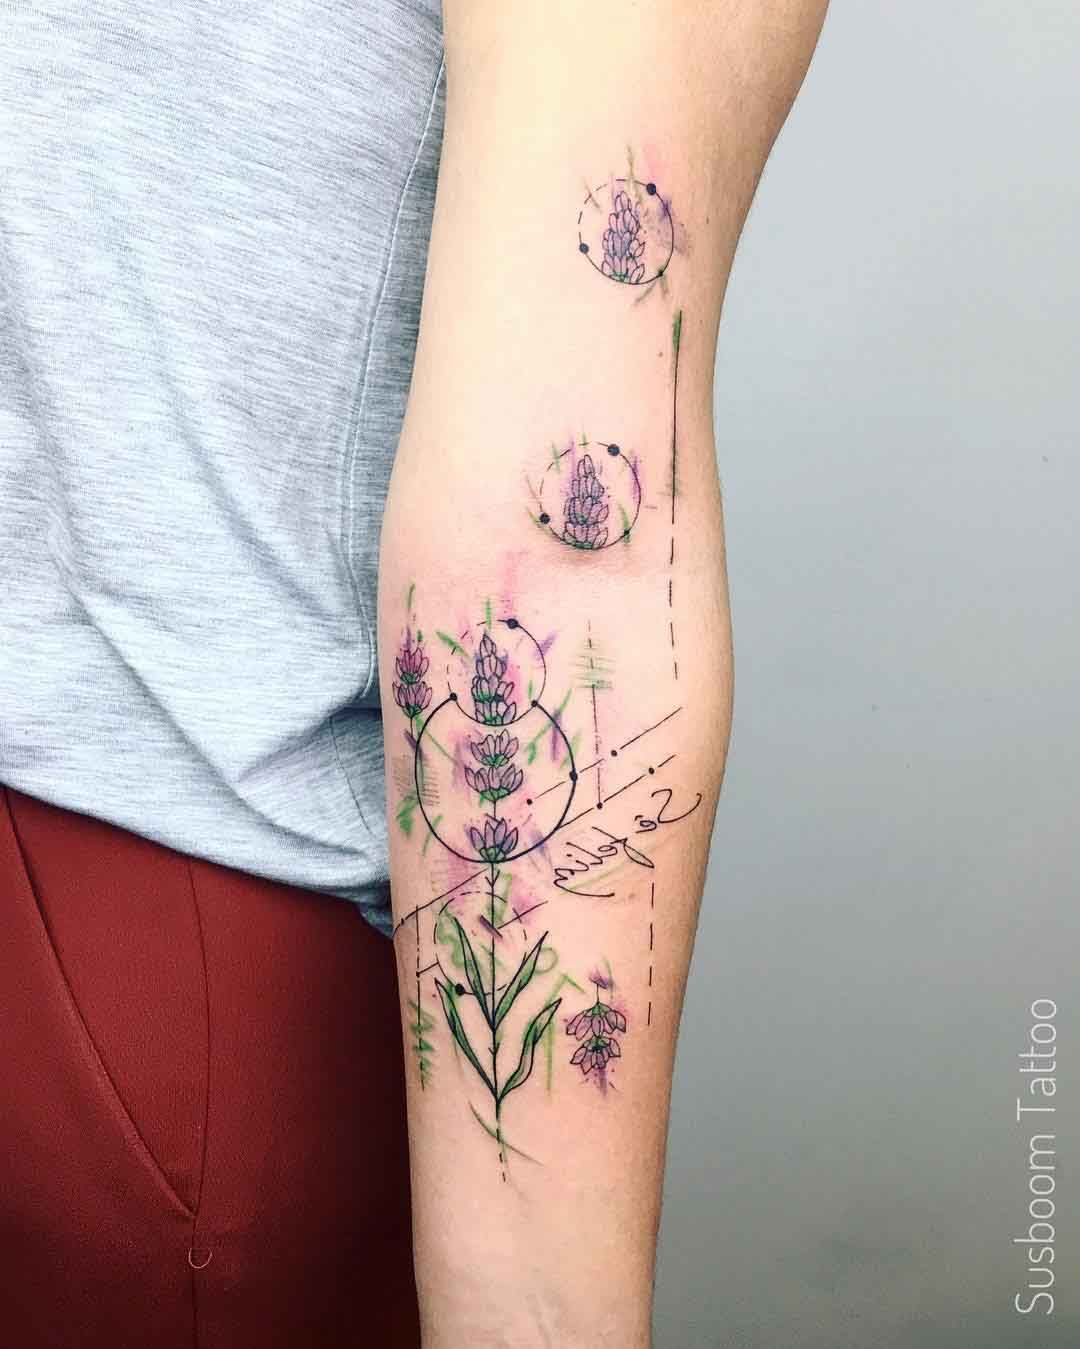 Pin De Claudia Membreño En Ideas Tattoos: Minimal Lavender Flower Tattoo